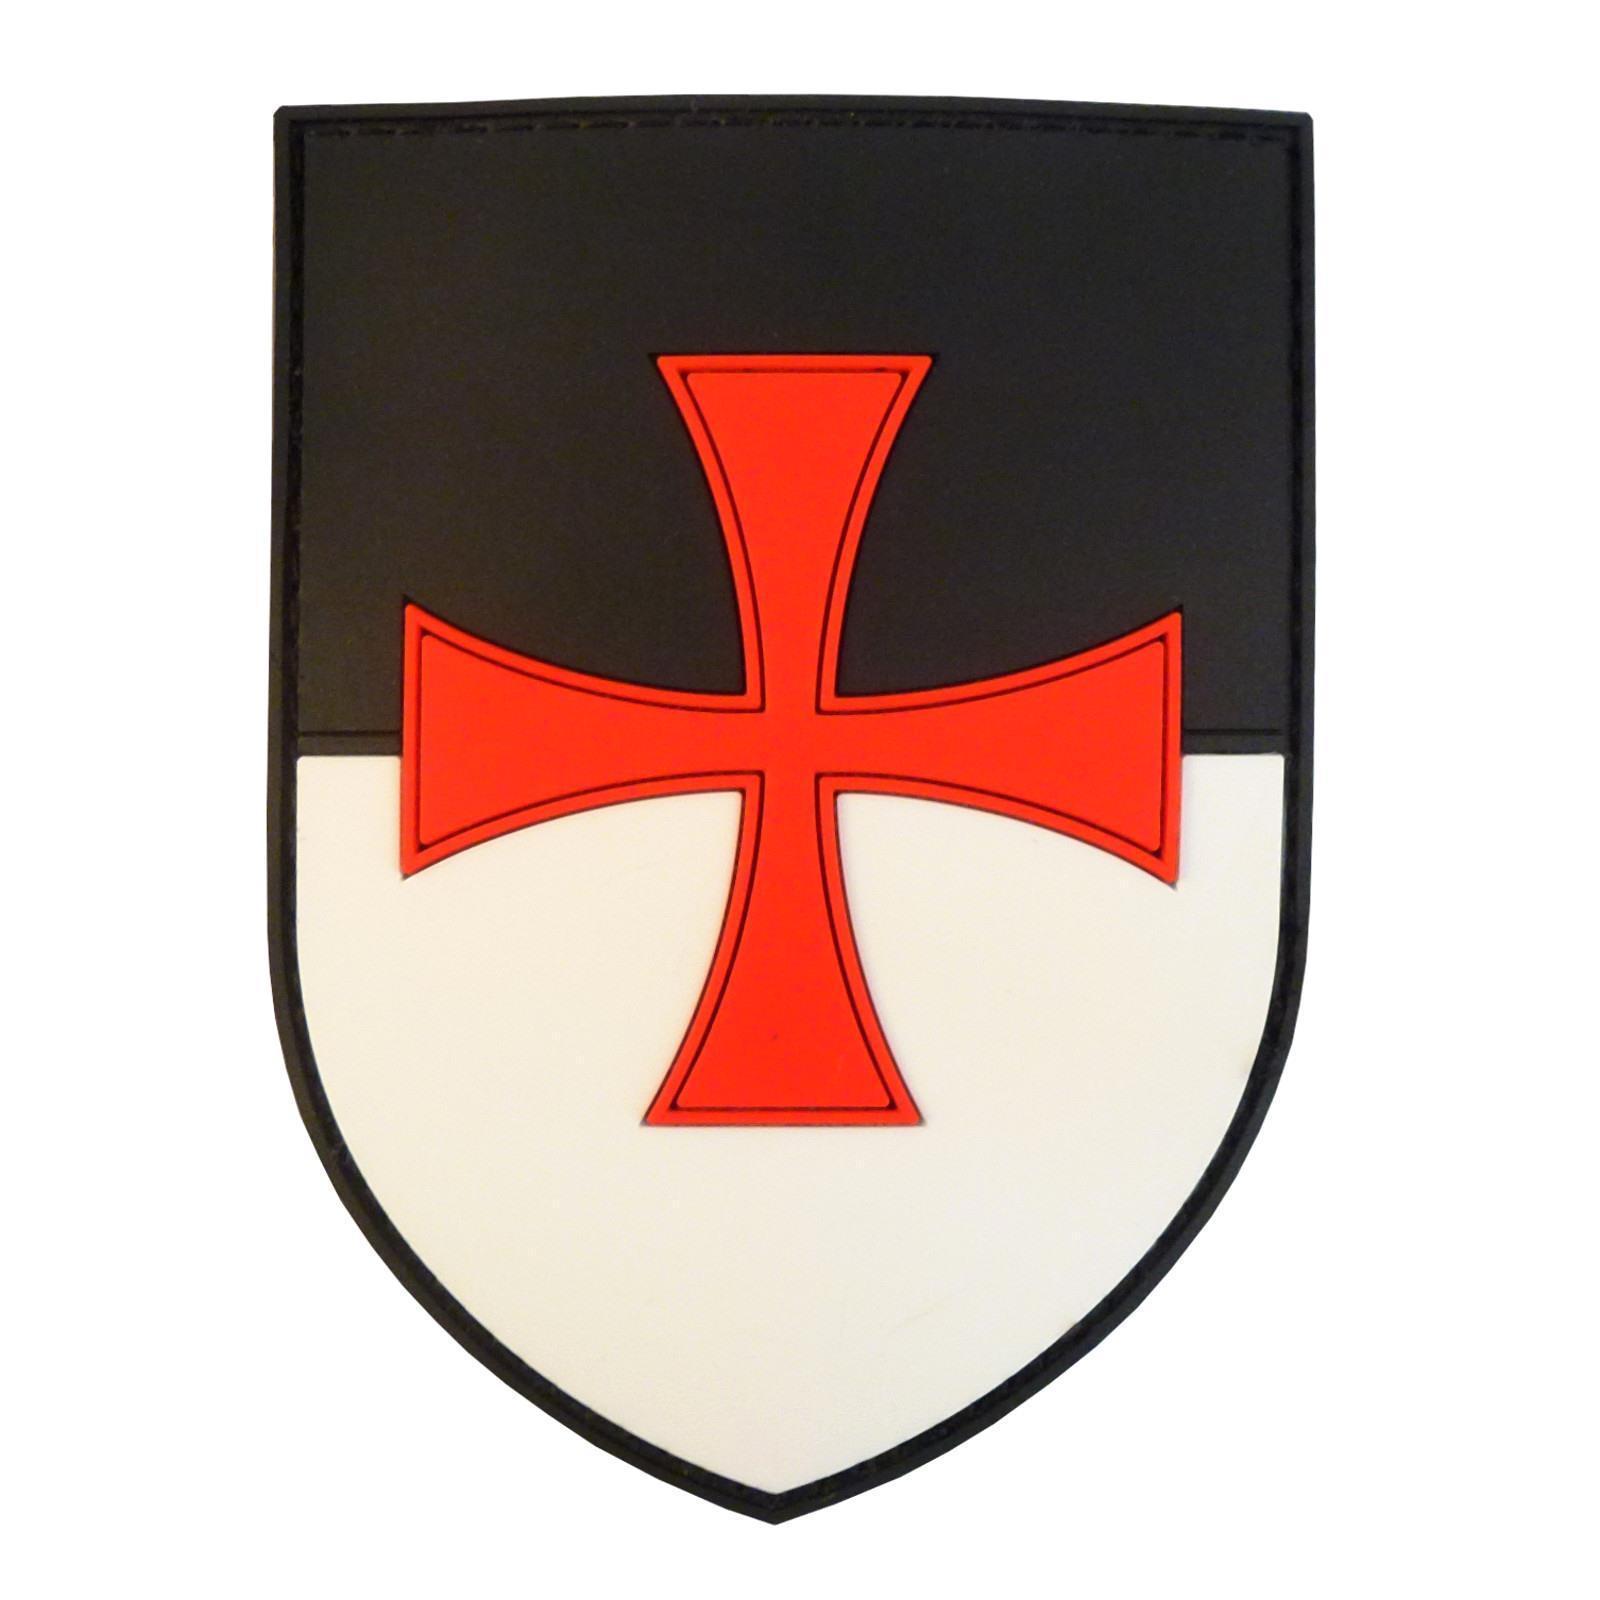 christian-shield-26.jpg&f=1&nofb=1